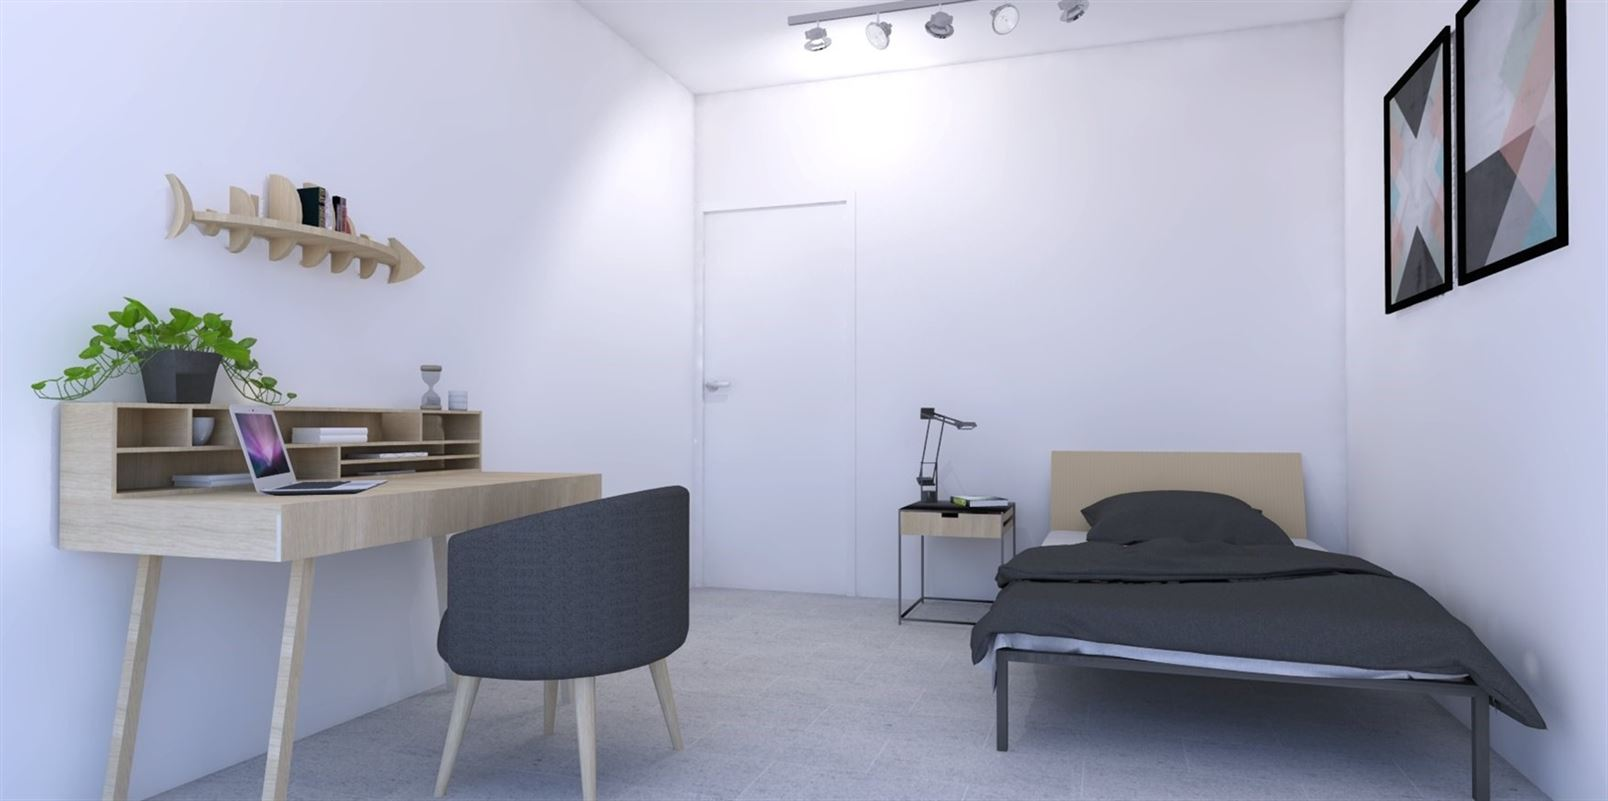 Foto 8 : Appartement te 3960 BREE (België) - Prijs € 226.800